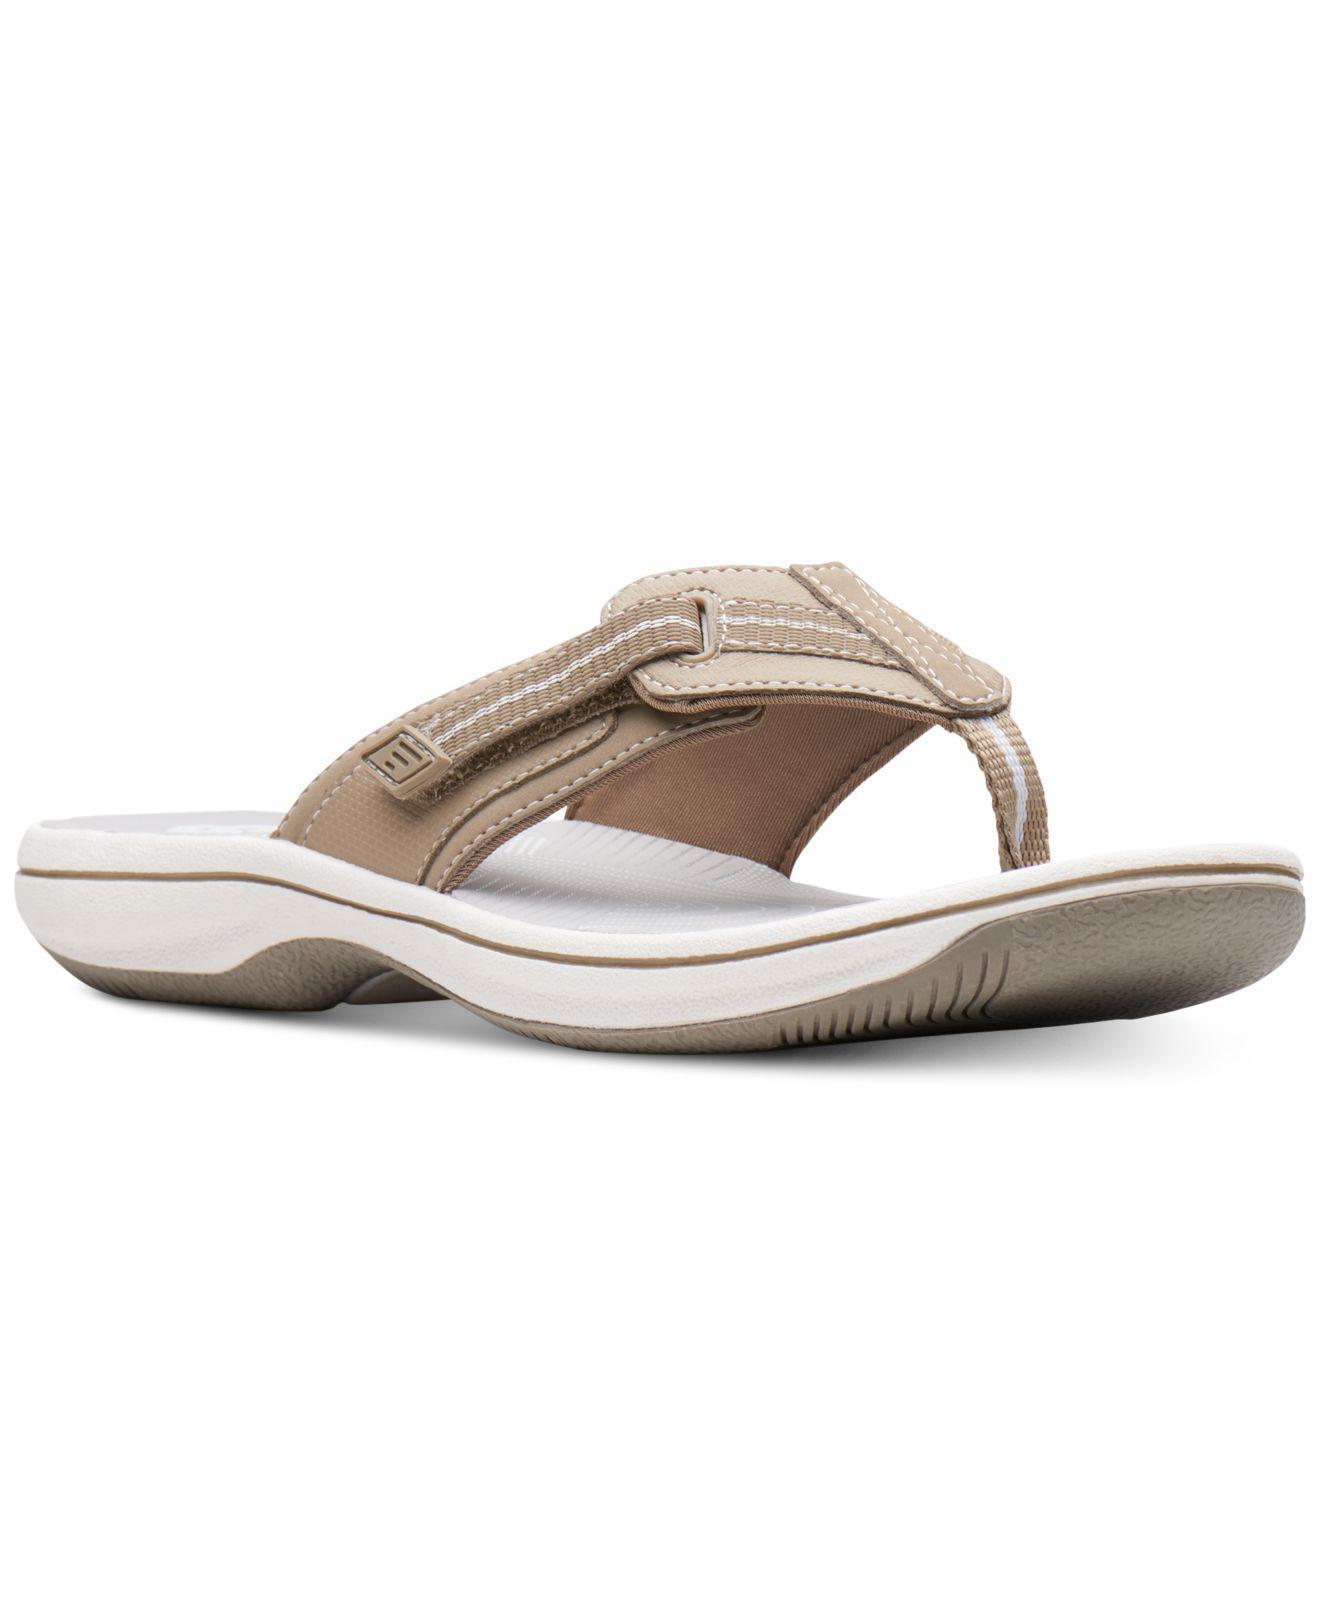 9c6e965d73b3da Lyst - Clarks Brinkley Jazz Flip-flops - Save 25%